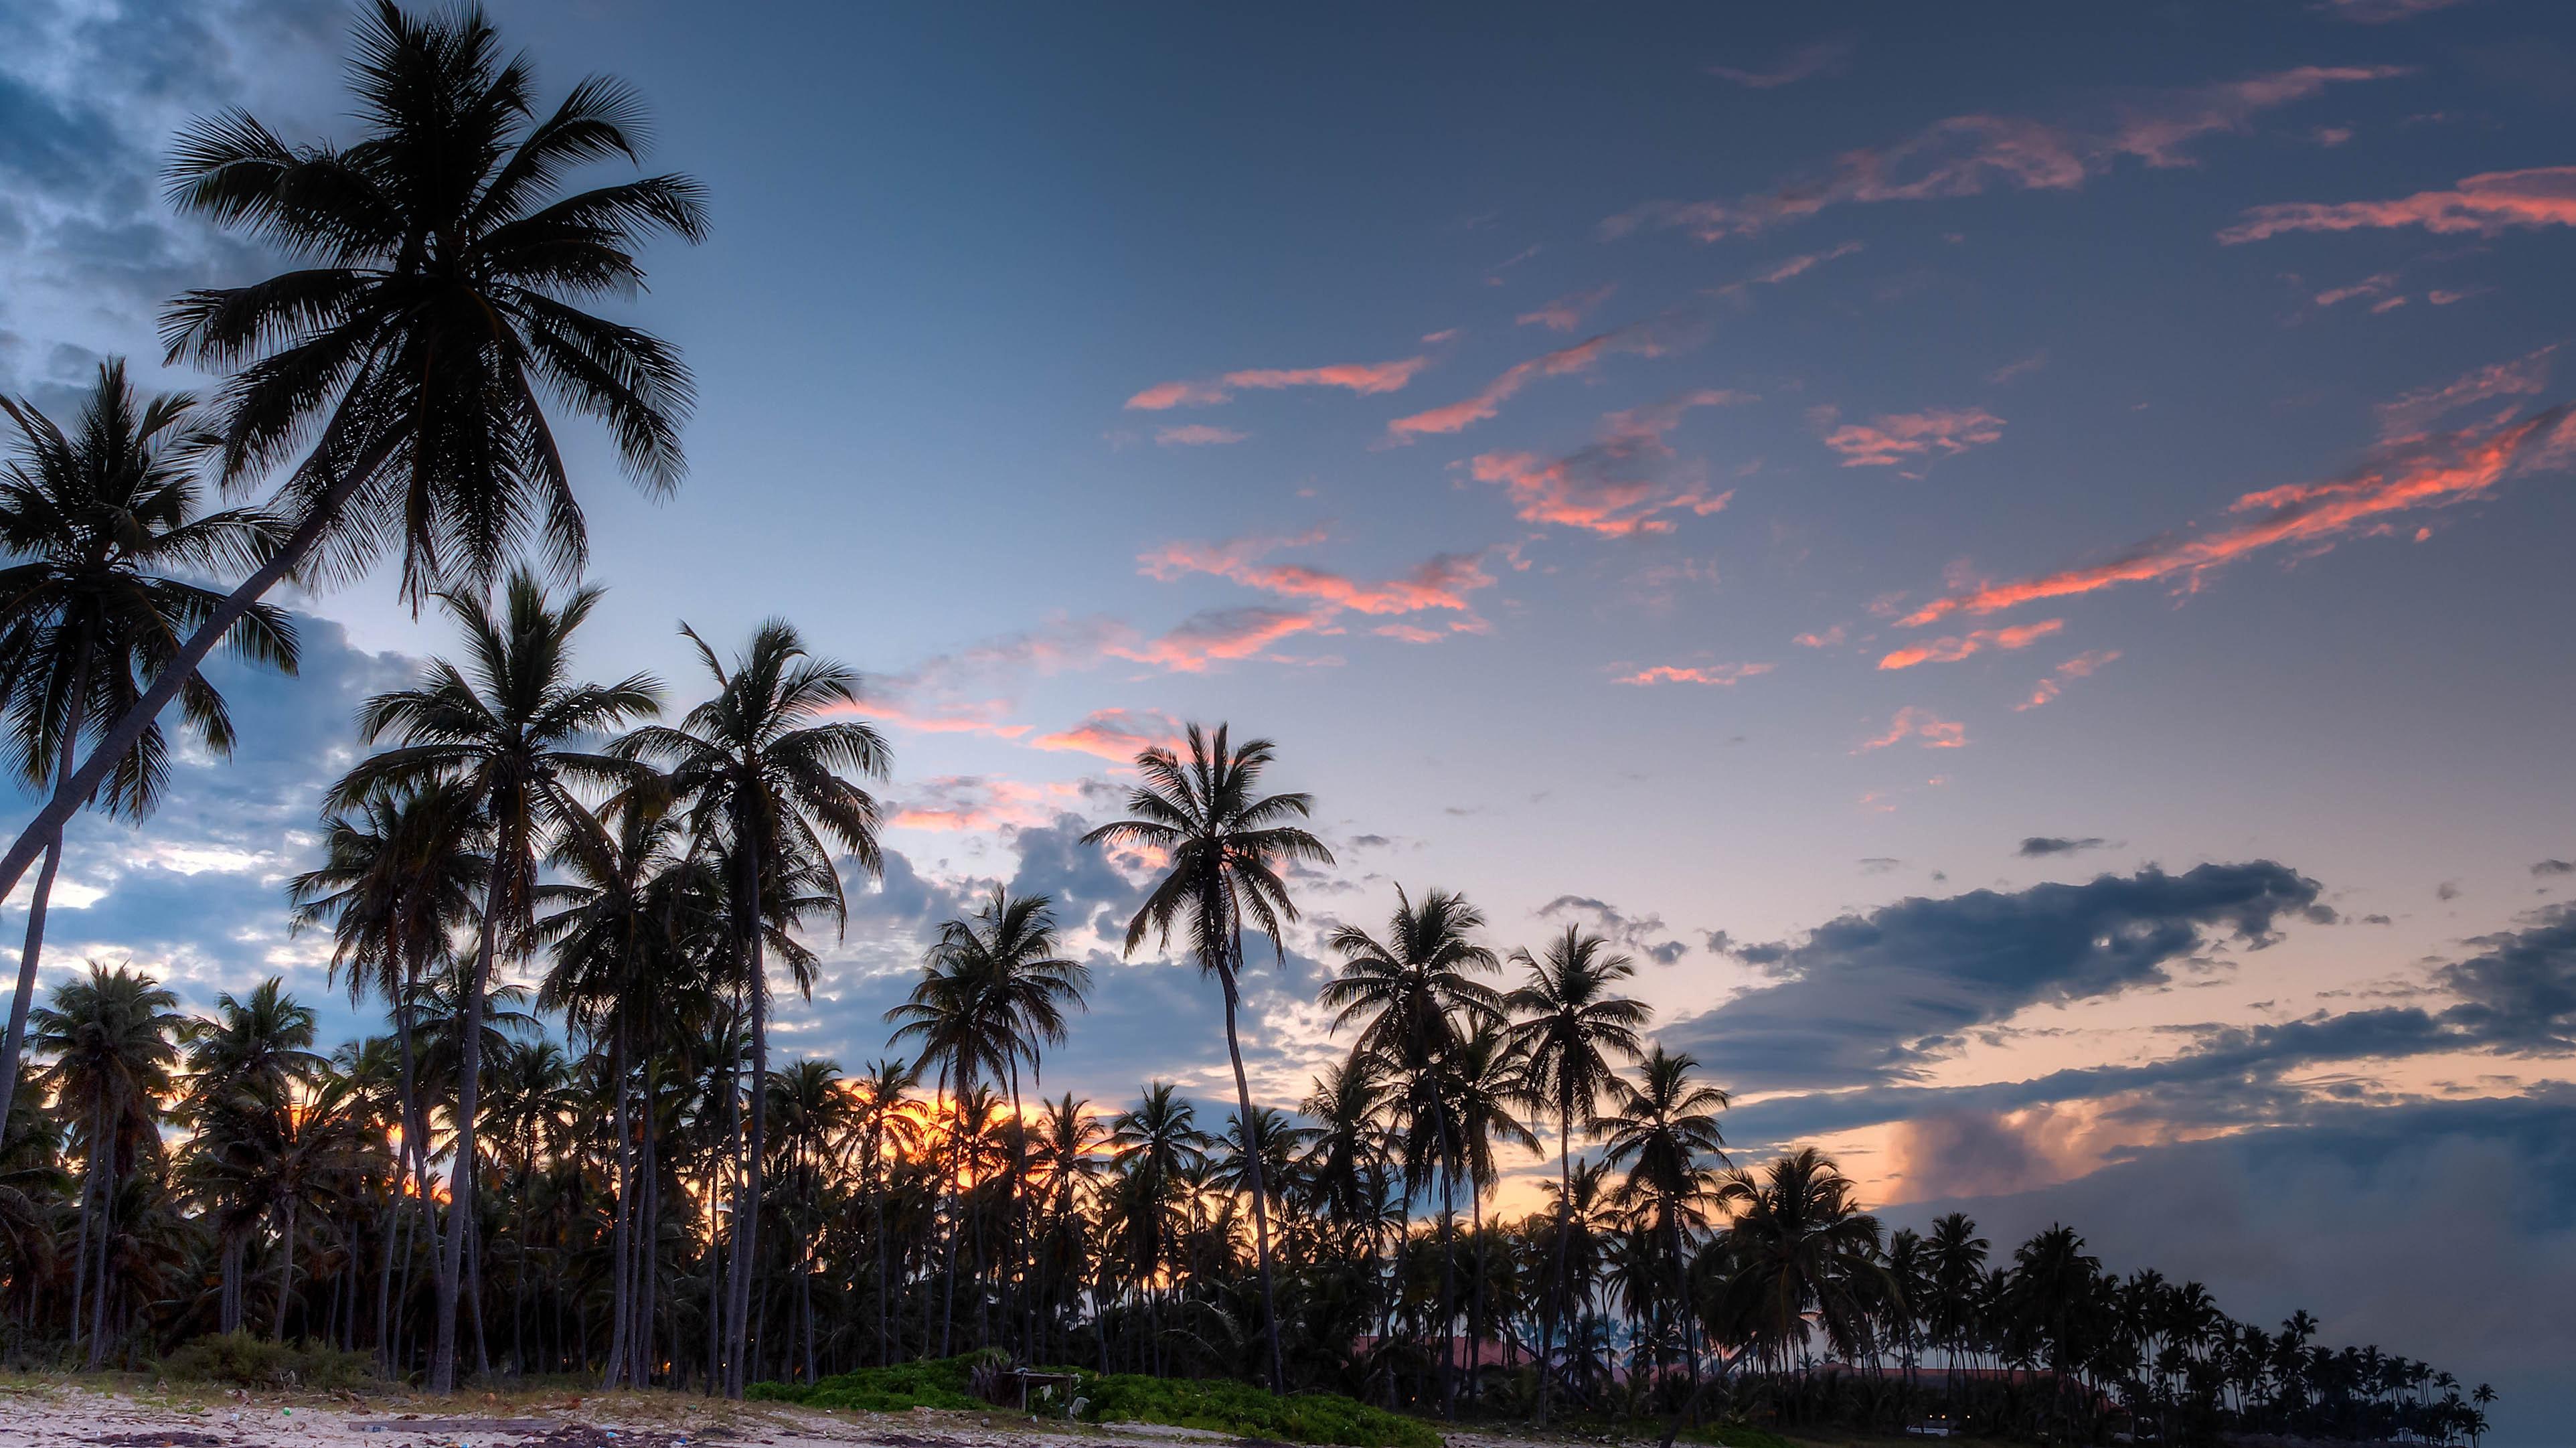 Coconut Palm Tress Beside Calm Lake Silhouette 183 Free